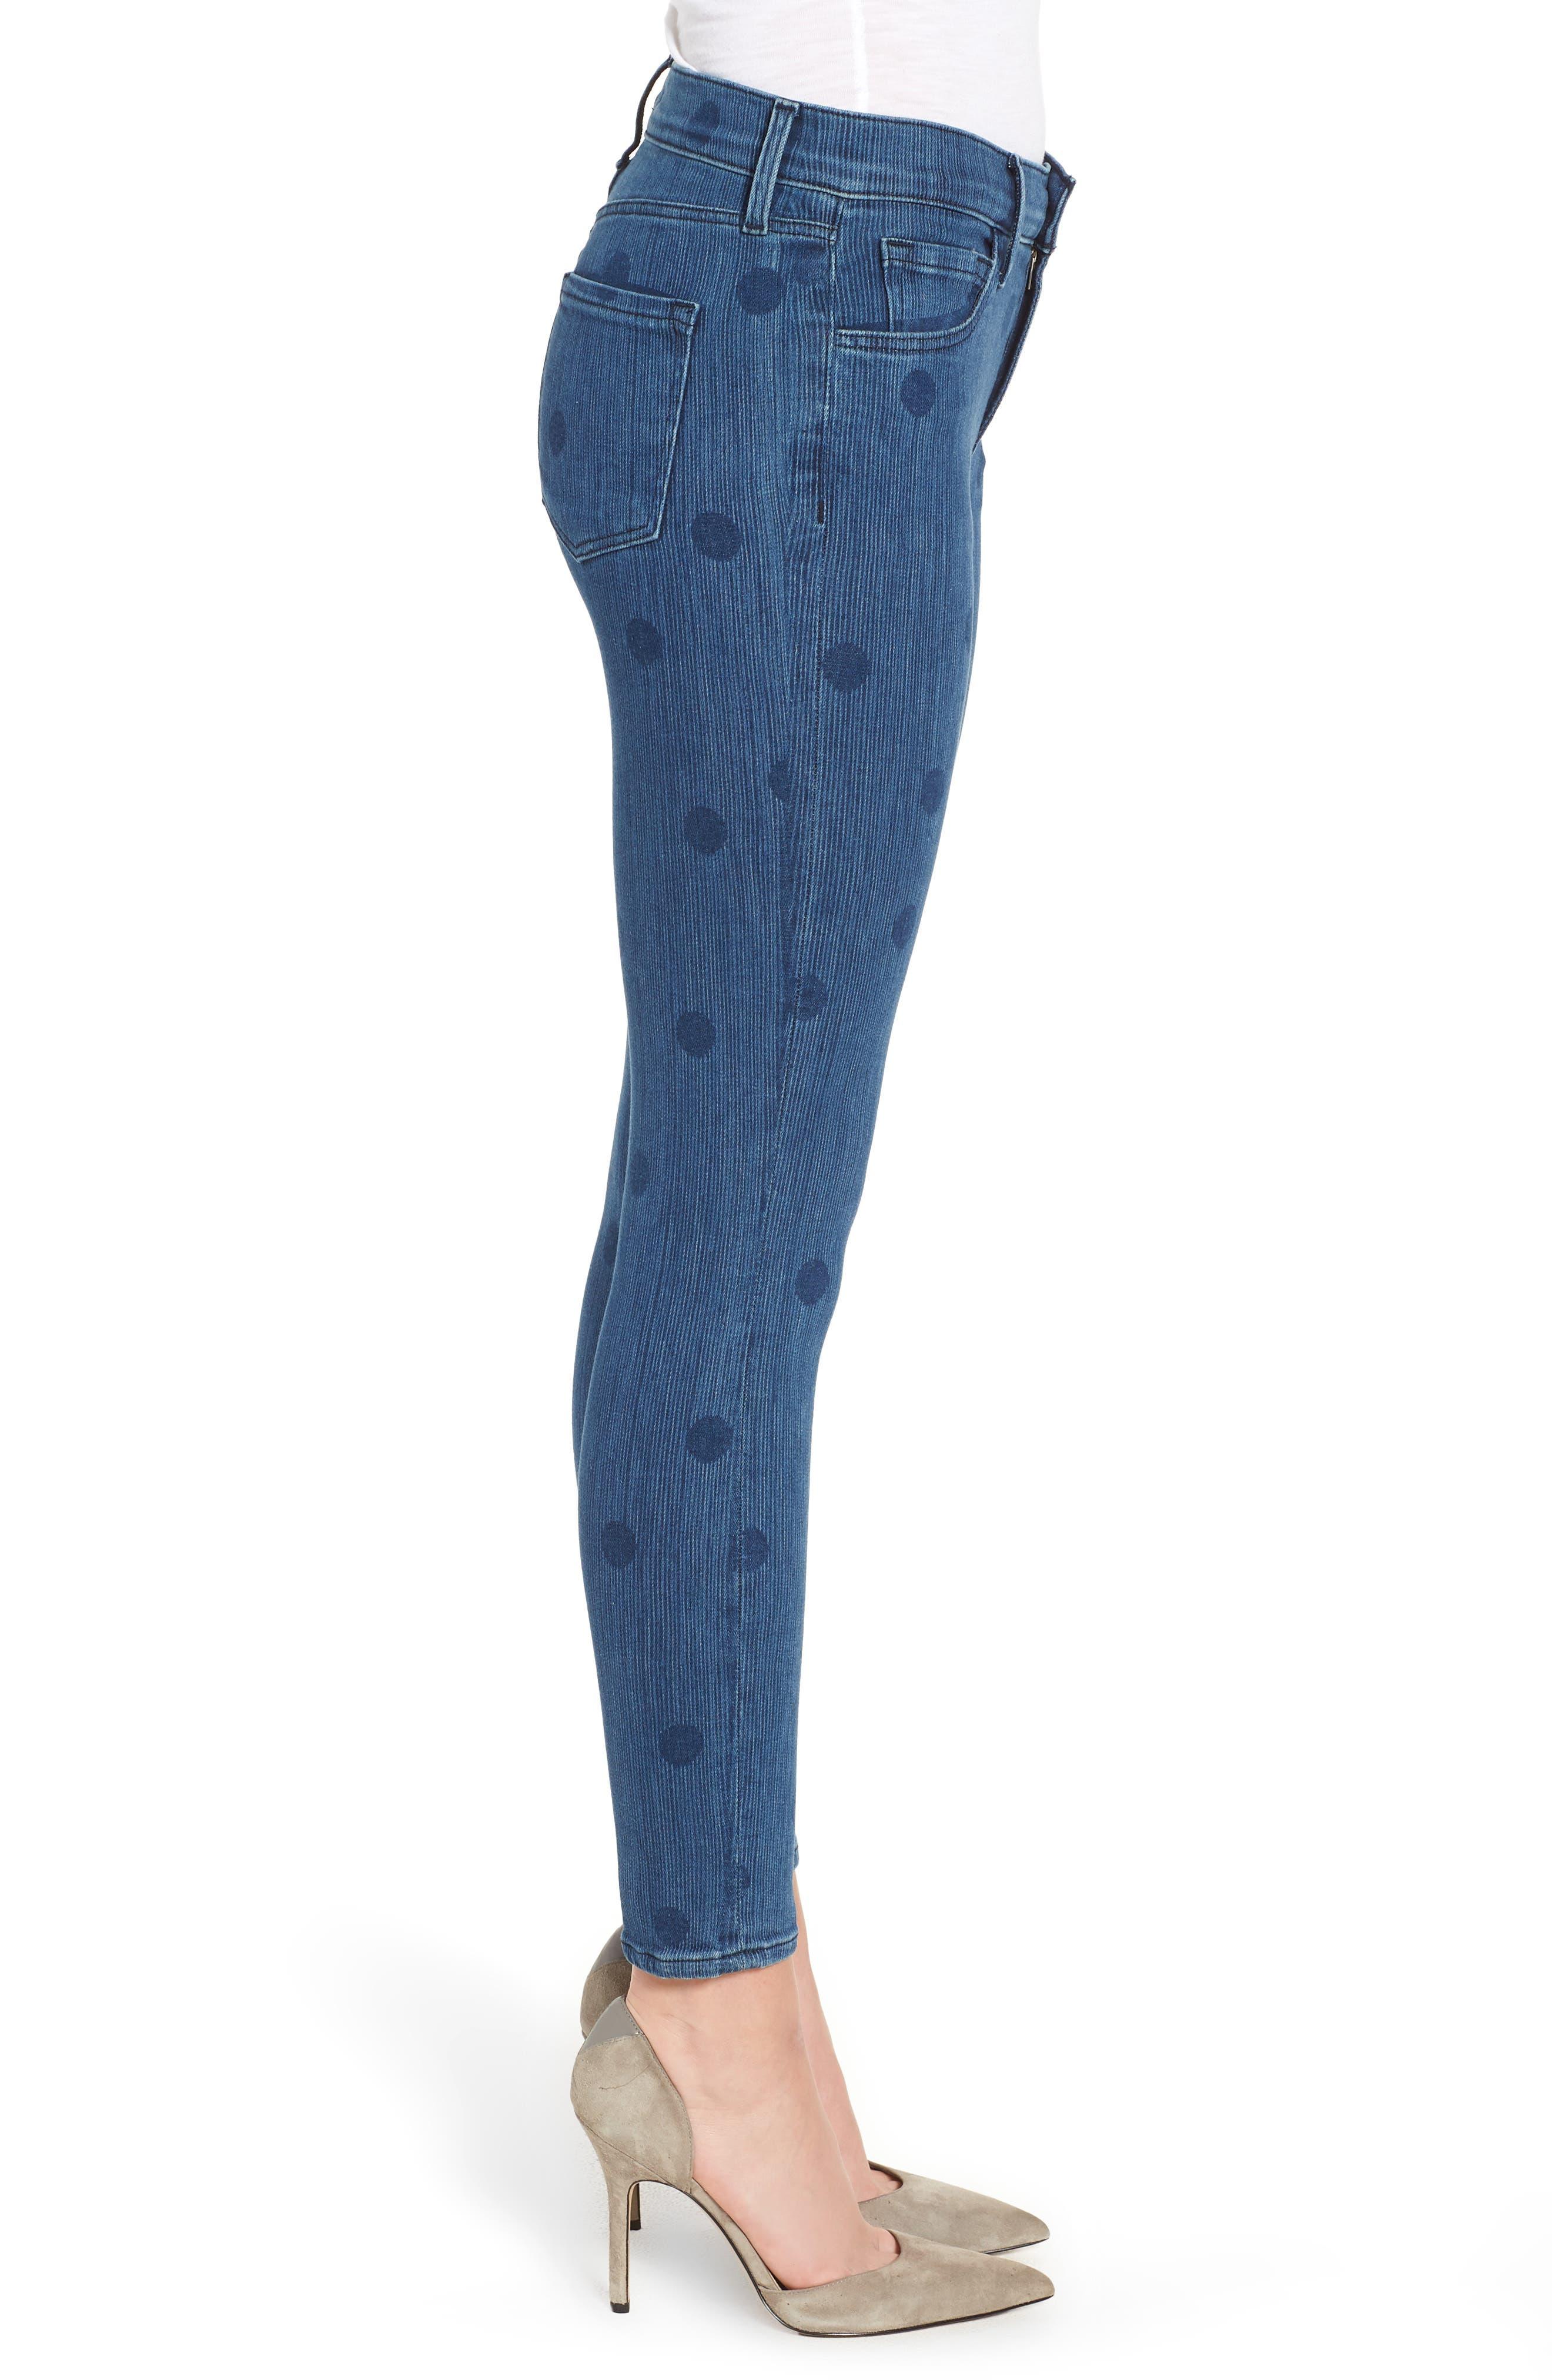 835 Capri Skinny Jeans,                             Alternate thumbnail 3, color,                             Aerial